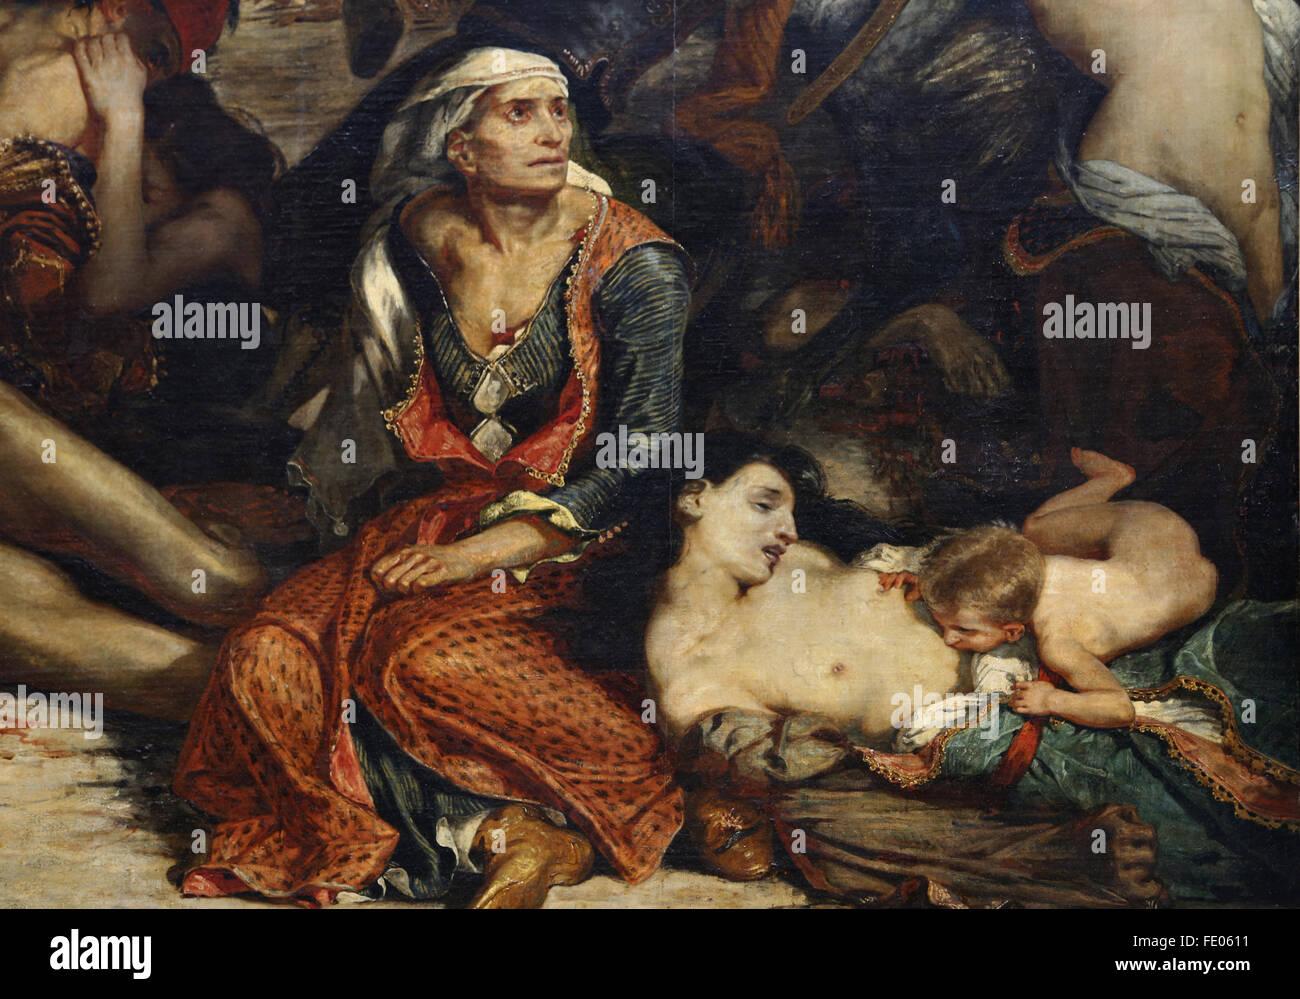 La masacre de Quíos (1822), el 11 de abril de 1824 por el pintor francés Eugène Delacroix (1798-1863). Guerra de Independencia griega. Foto de stock